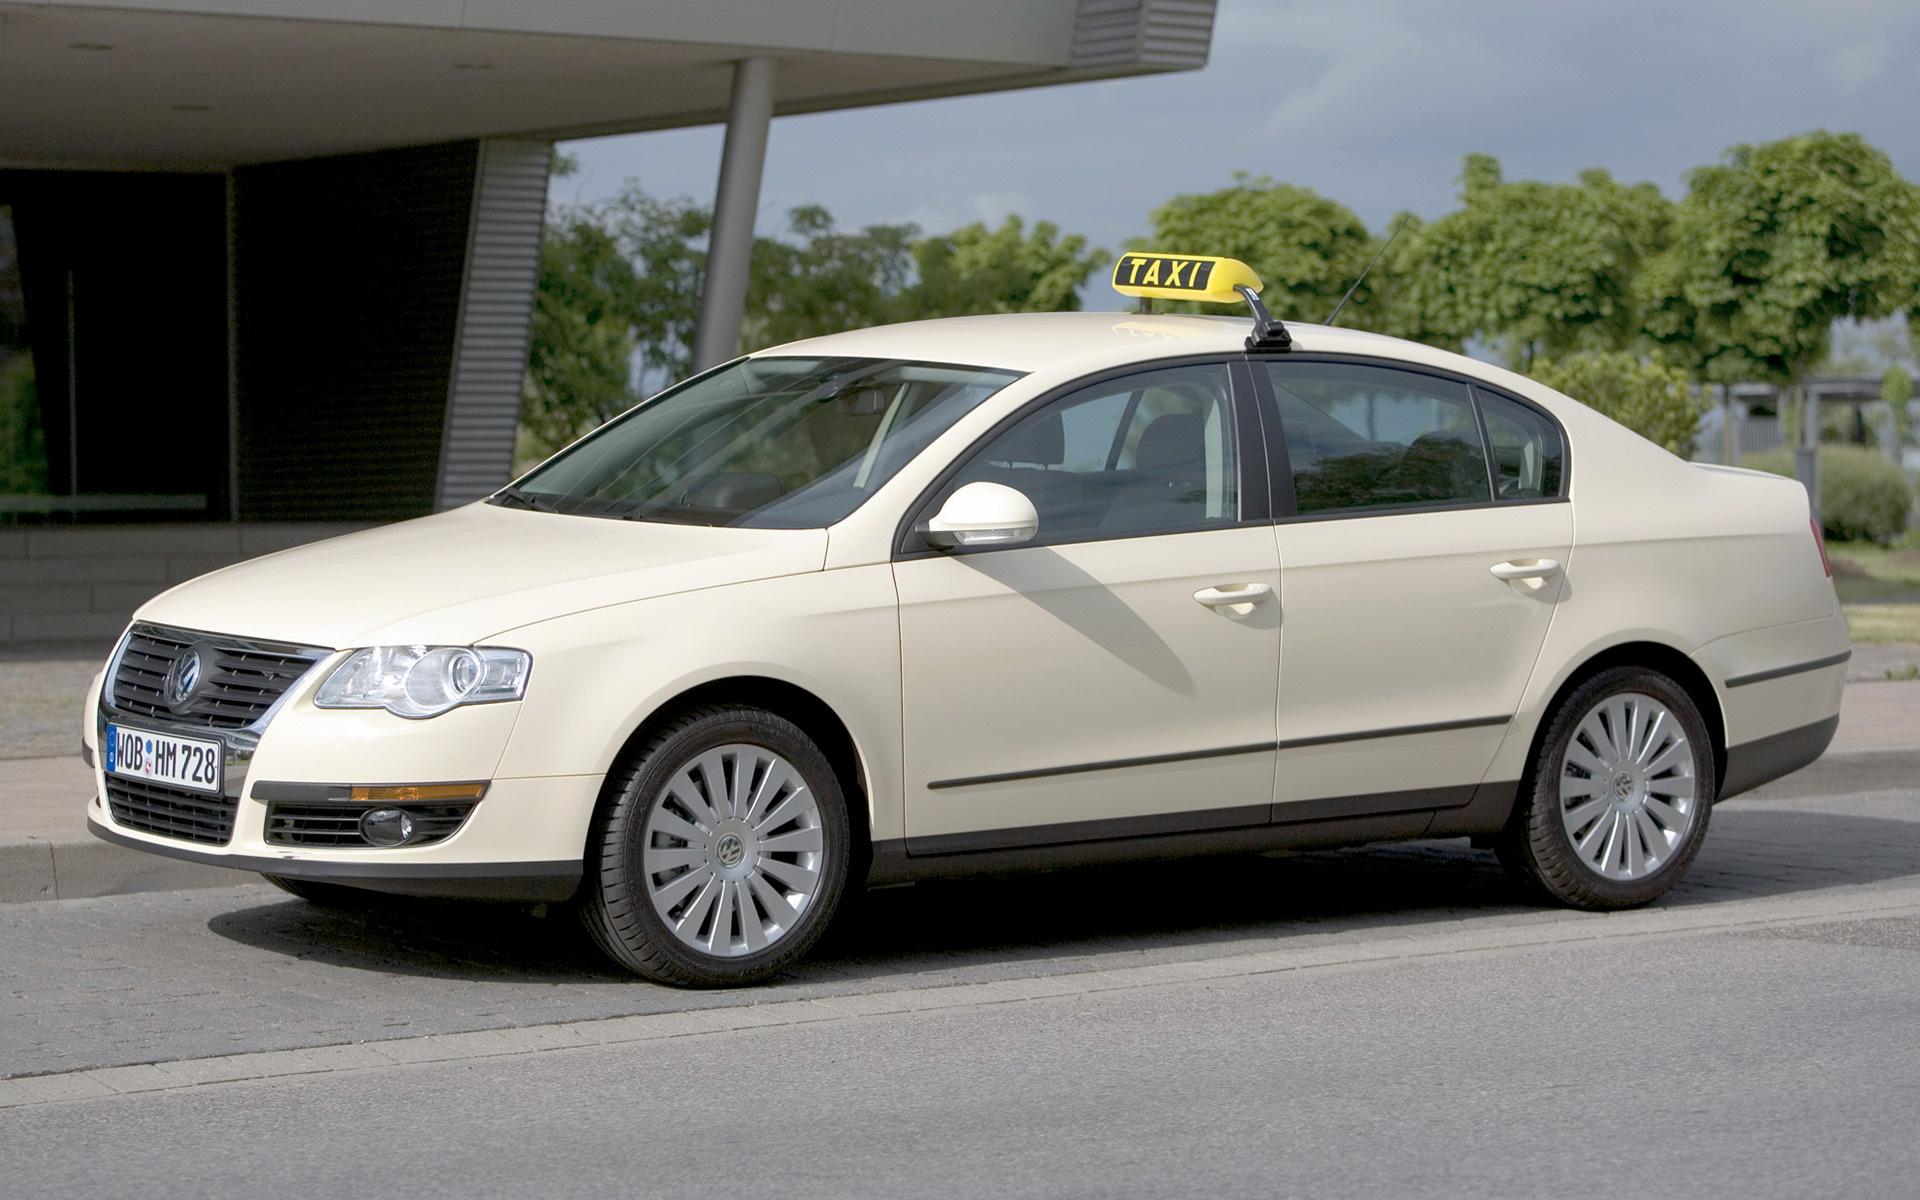 Volkswagen Passat Taxi 2005 Wallpapers And Hd Images